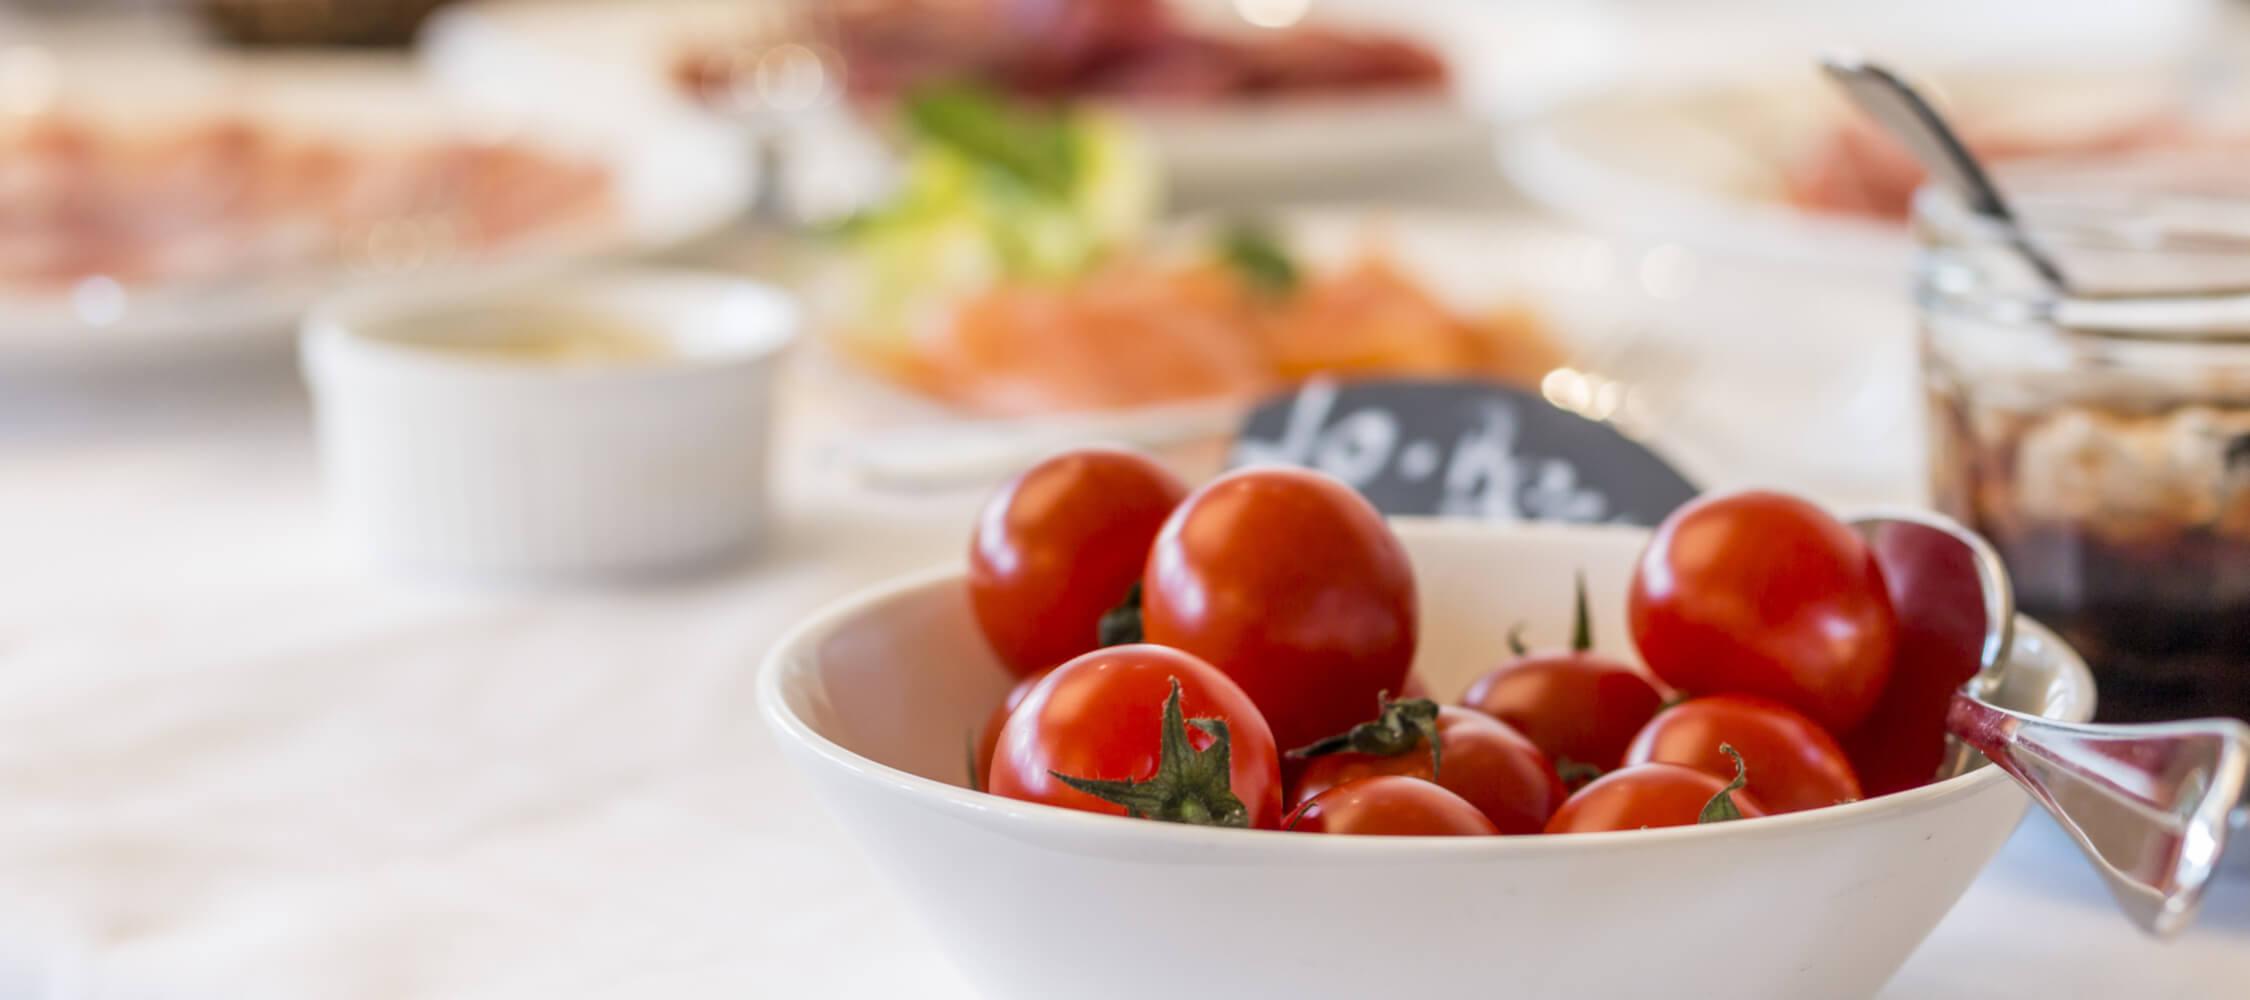 Hotel-Villa-Laurus-Merano-Restaurant-Breakfast-Buffet-Fruehstueck-Essen-Buffet-143902596_L-2250x1000